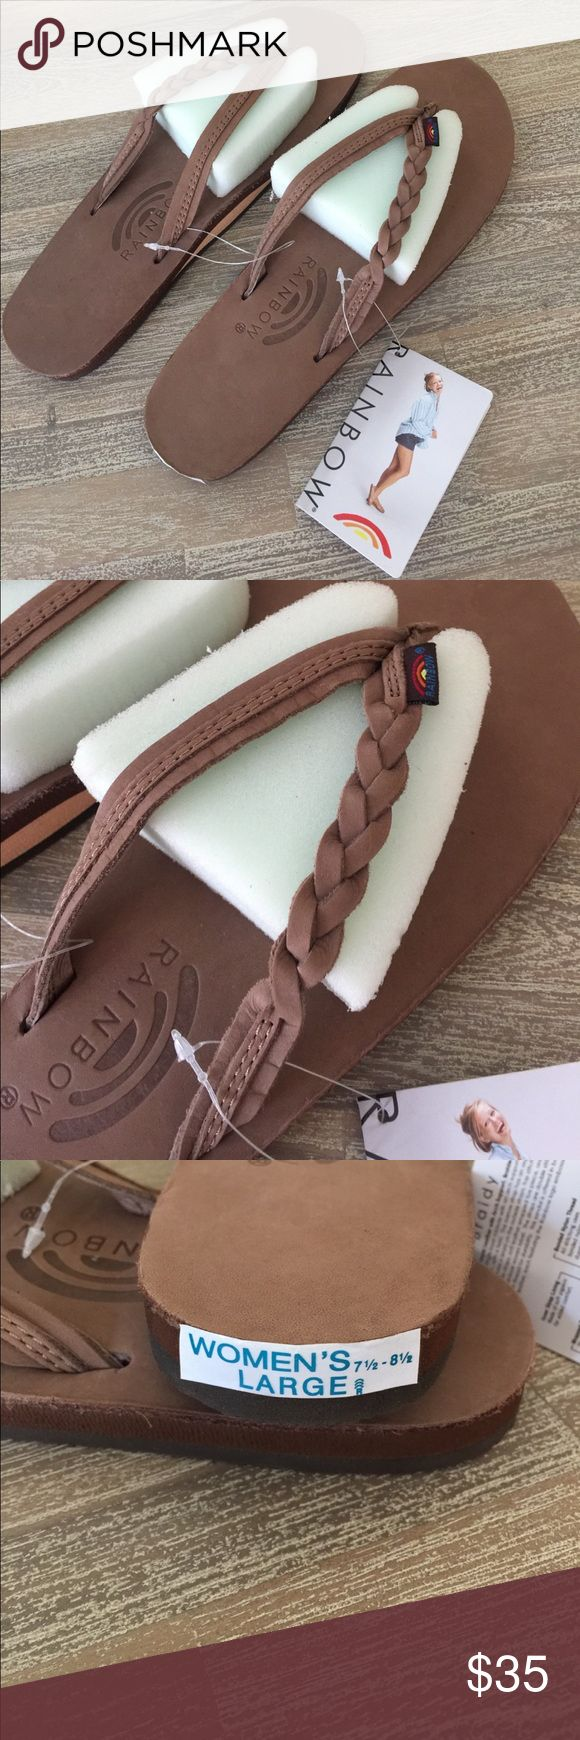 Rainbow Sandals. Size Large 7.5-8.5. NWT Rainbow Sandals. Size Large 7.5-8.5. NWT. Bought wrong size Rainbow Shoes Sandals